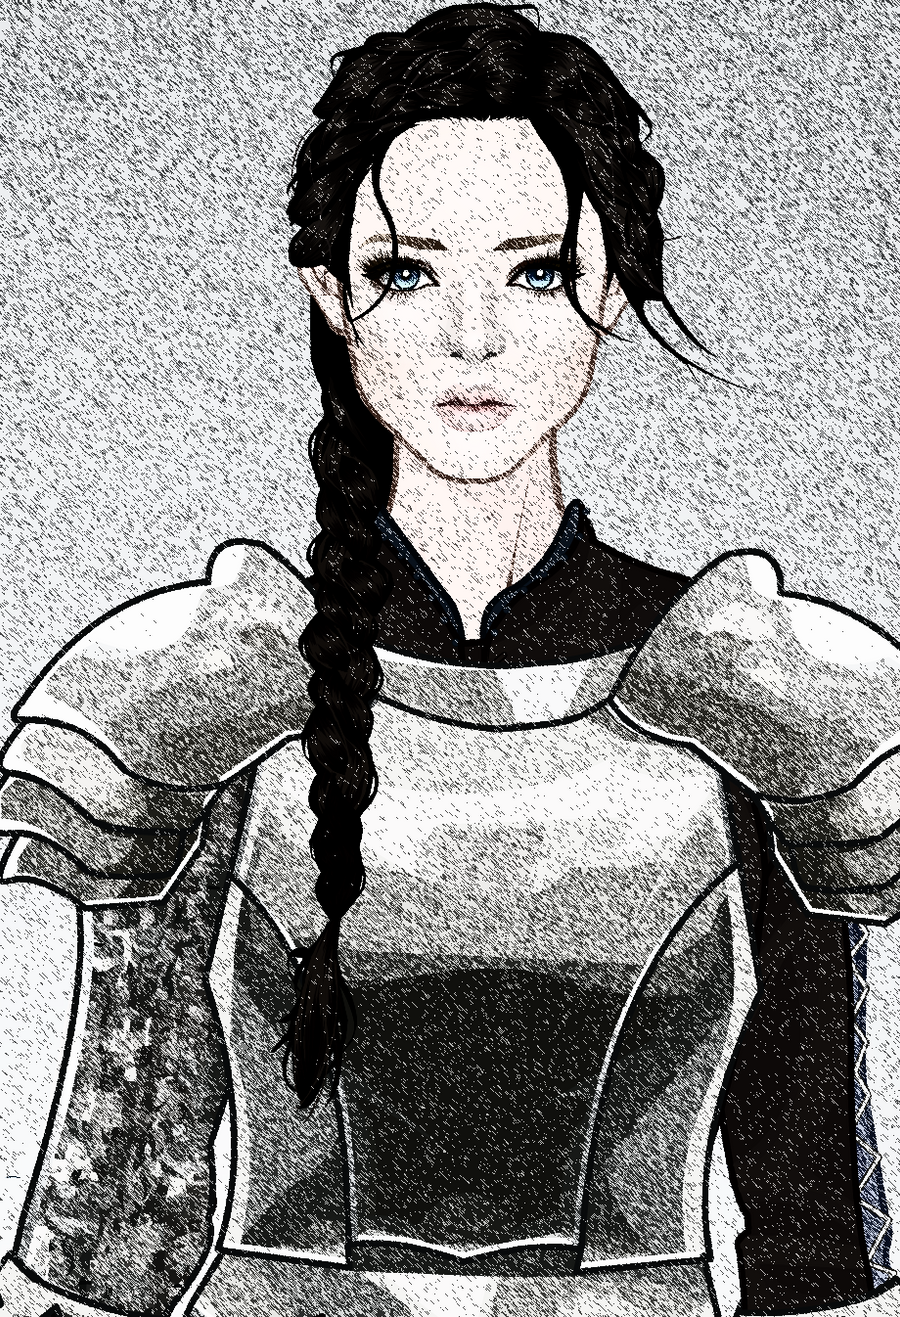 Arya Stark - Revange by EcaJT